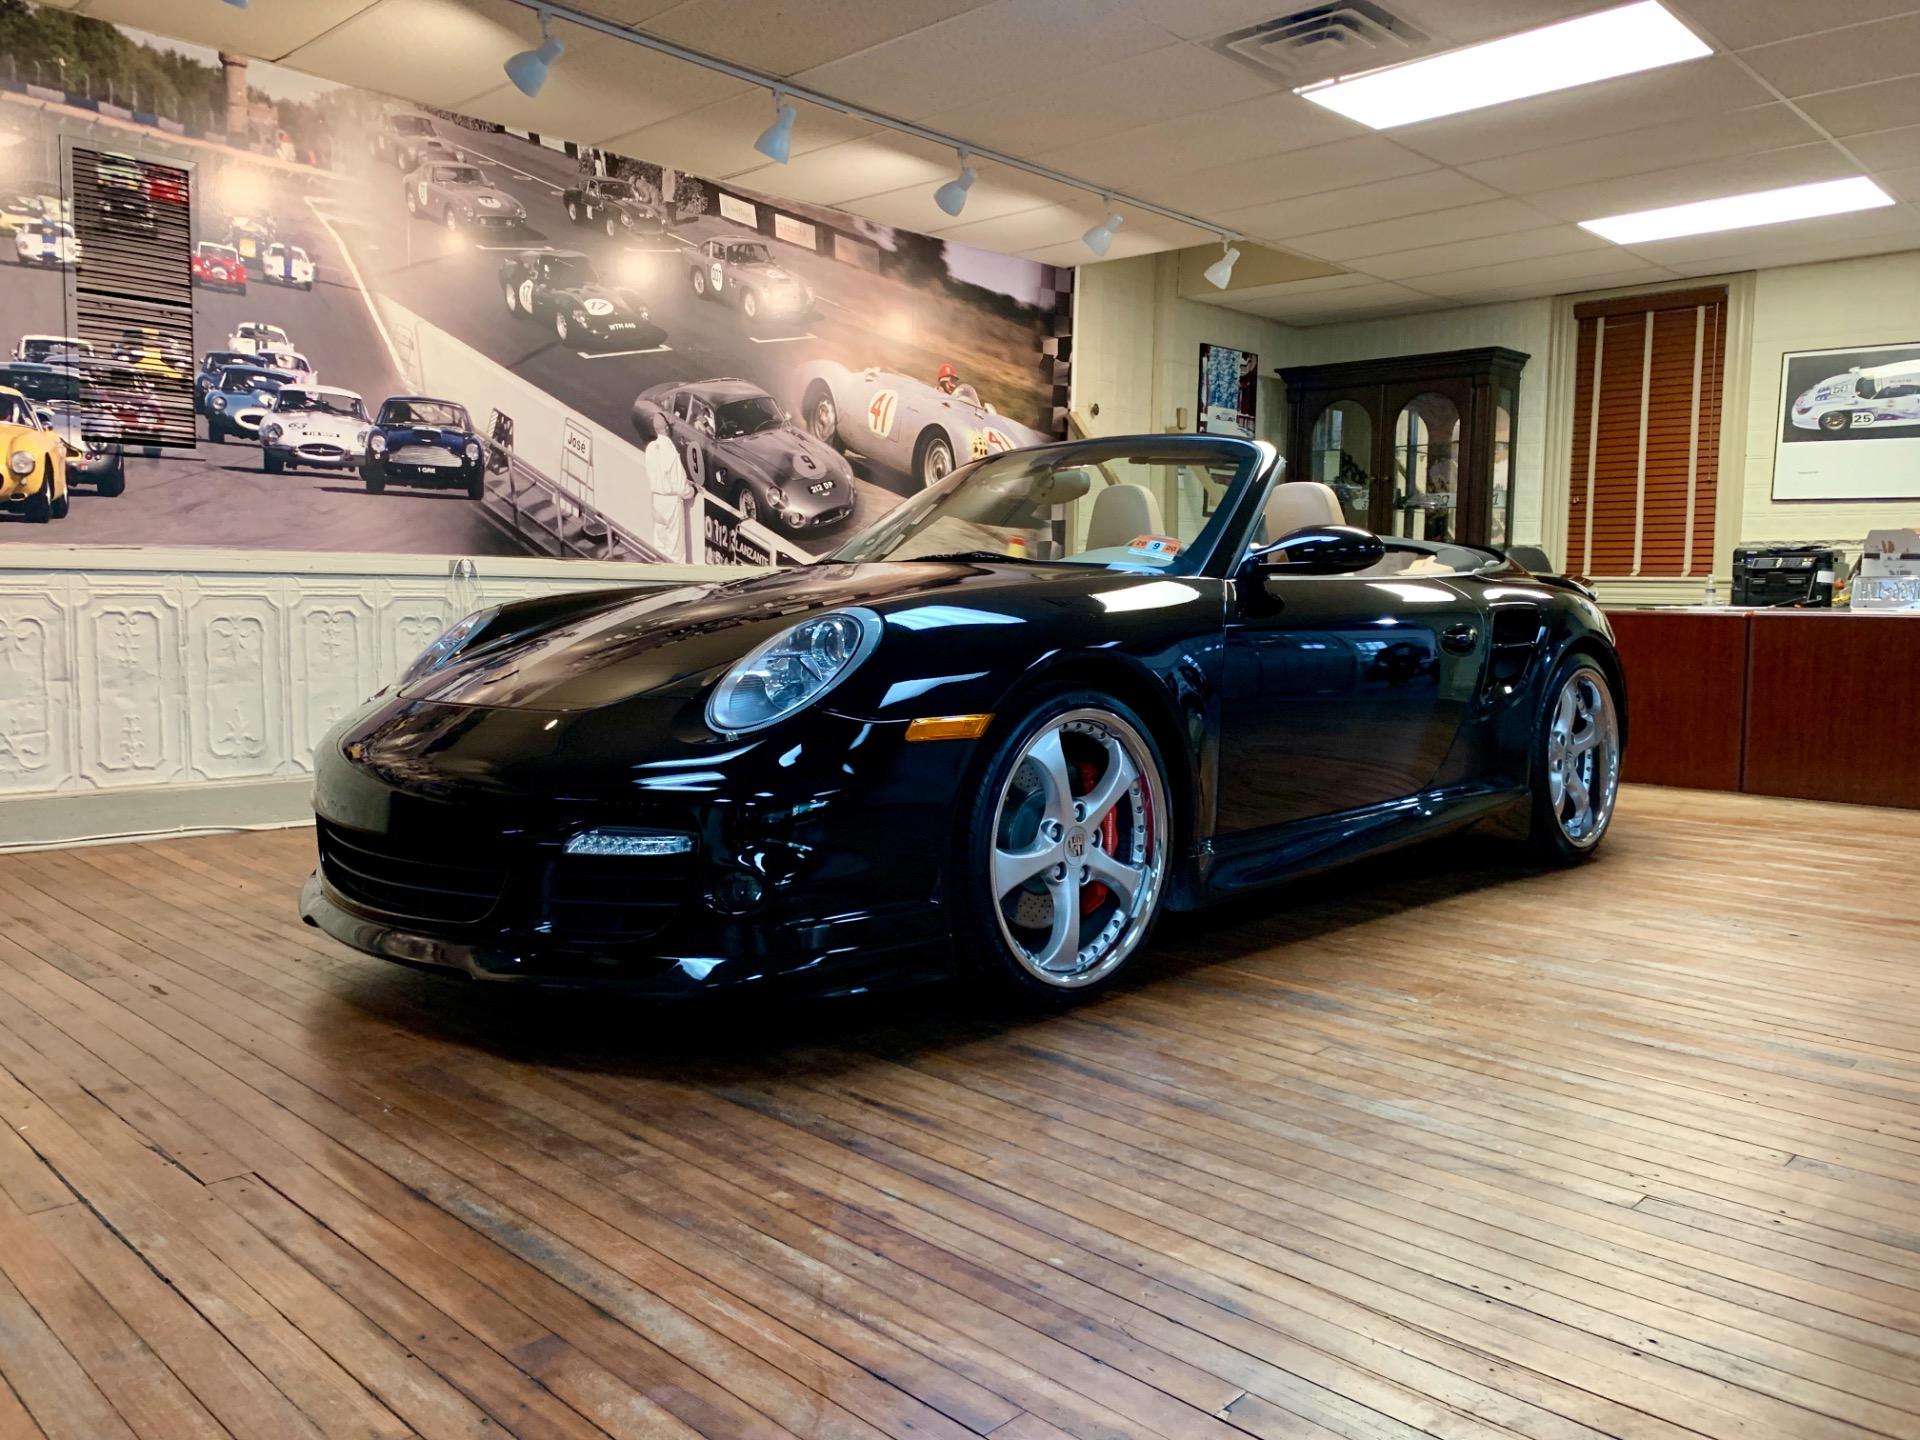 Used 2009 Porsche 911 Turbo Cabriolet  | Peapack, NJ